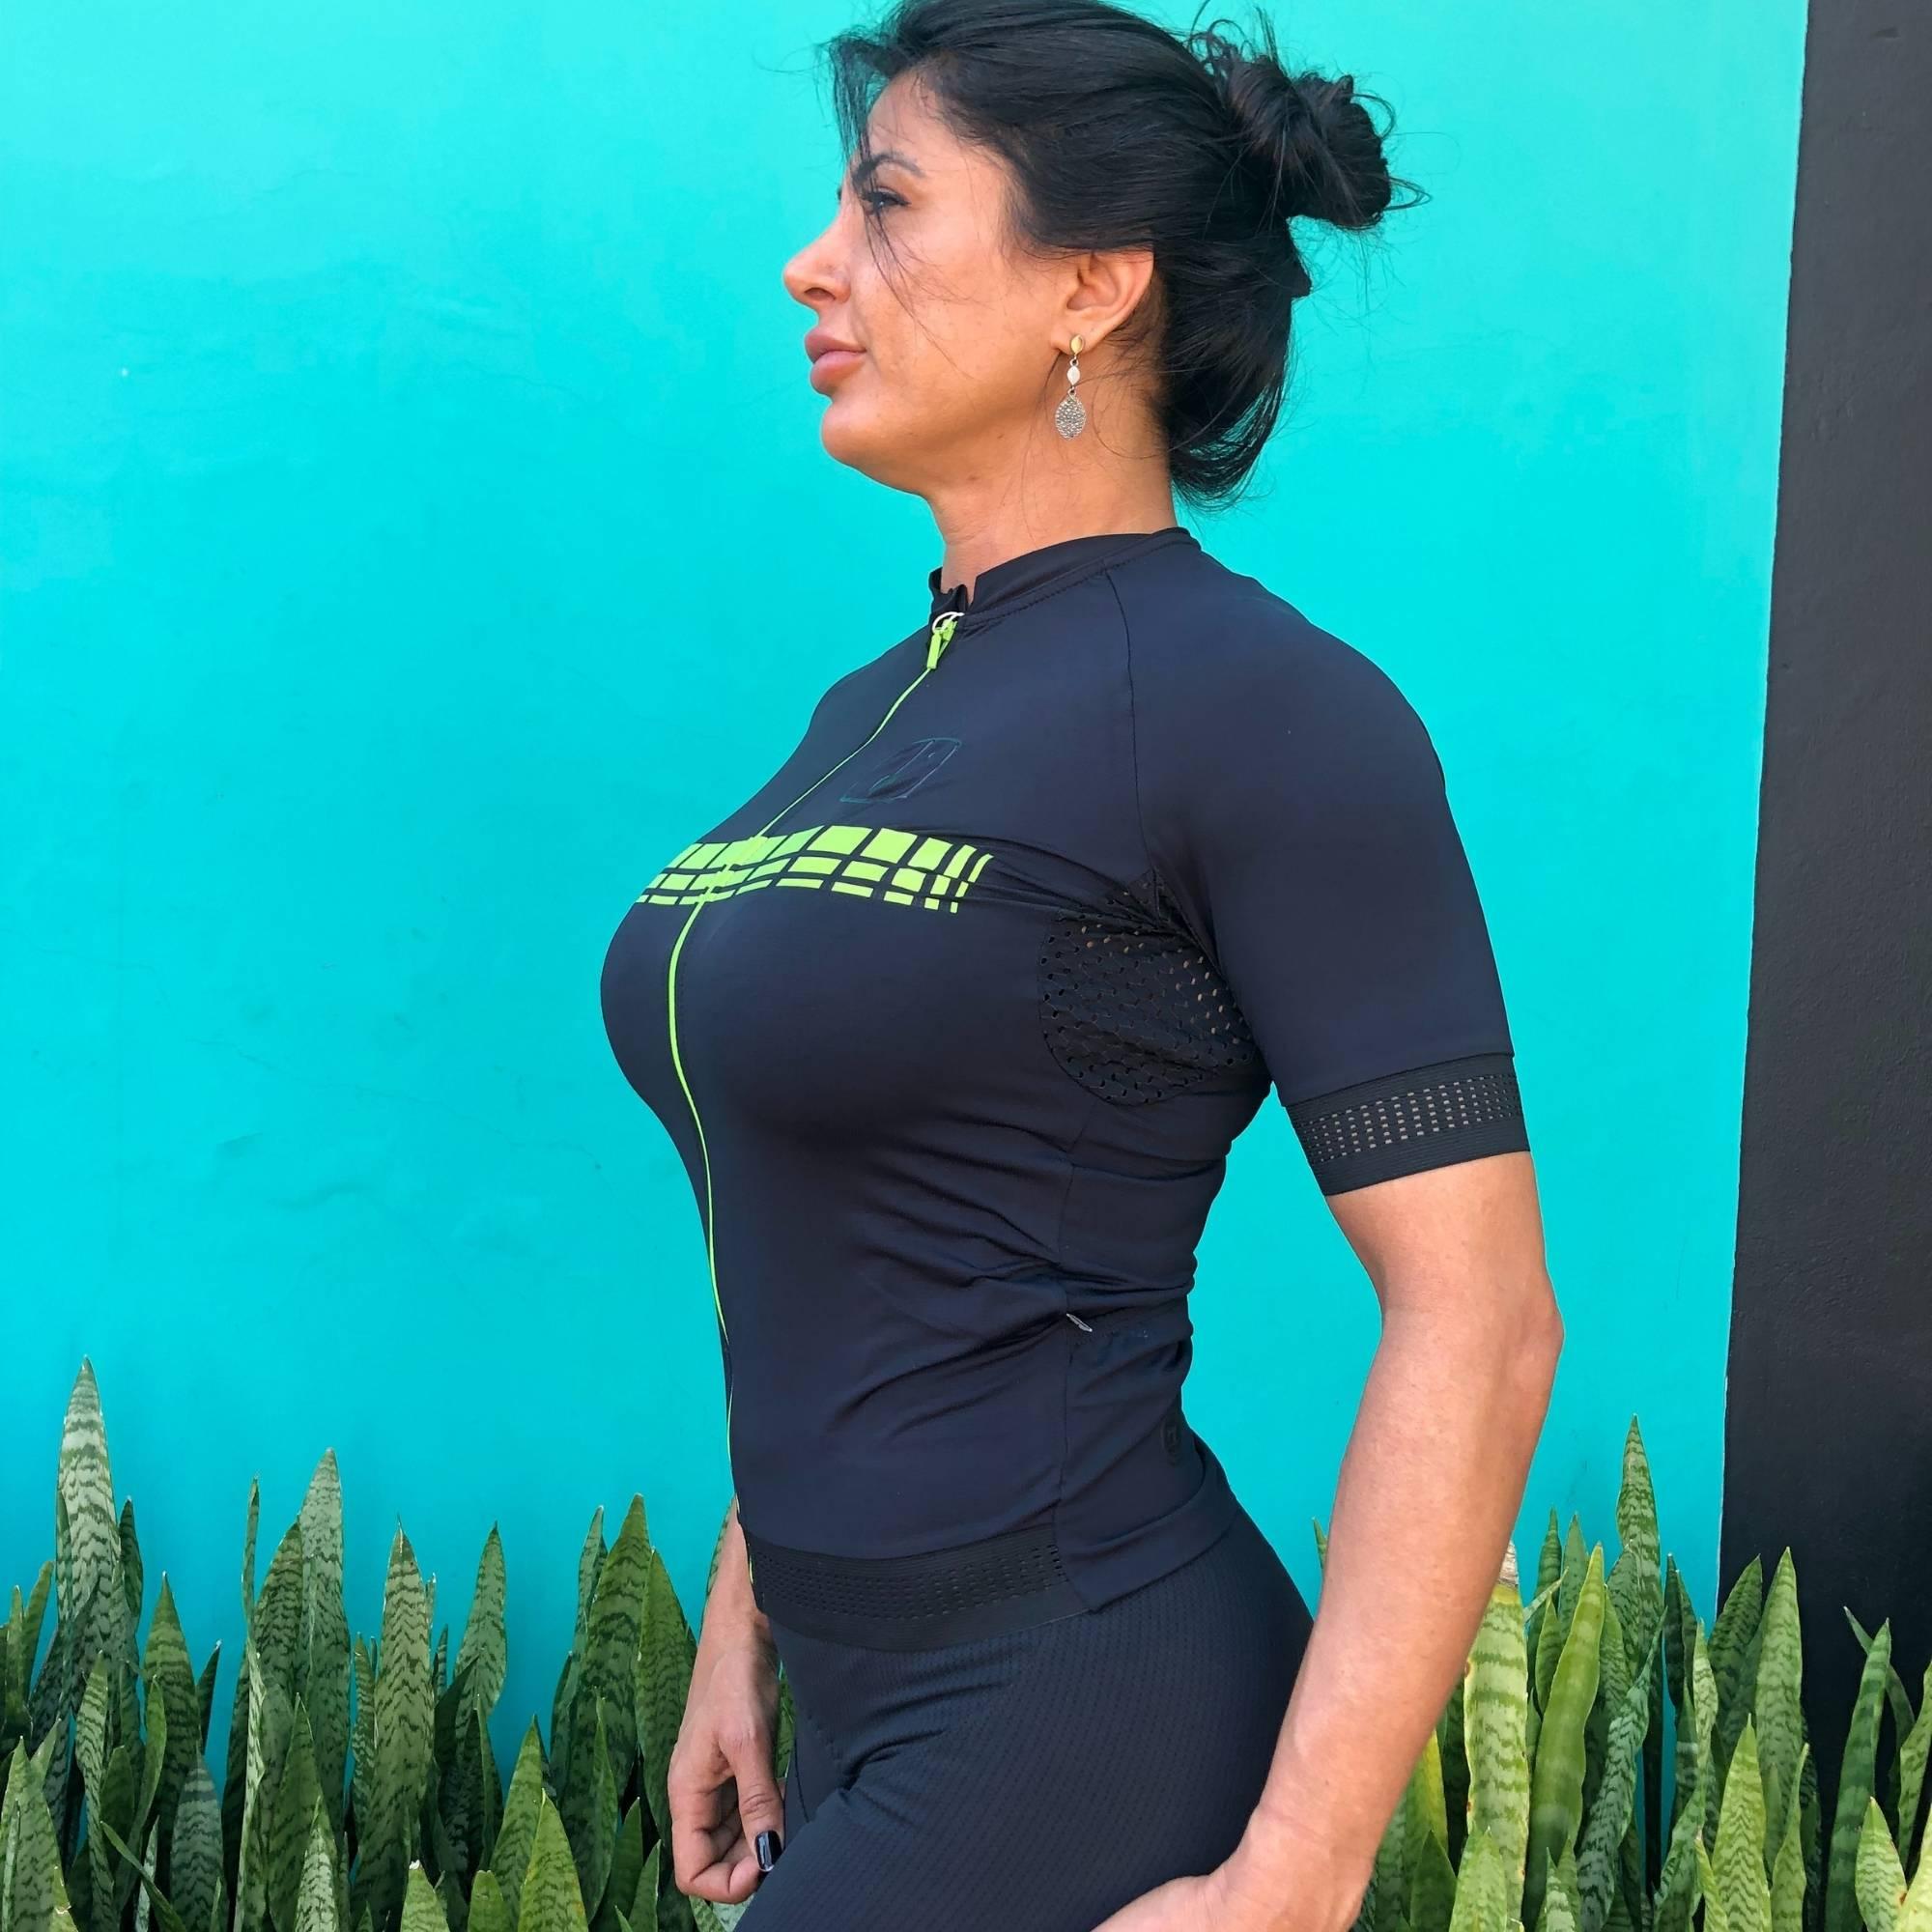 Camisa Ciclismo Racing Black / Neon - Feminina